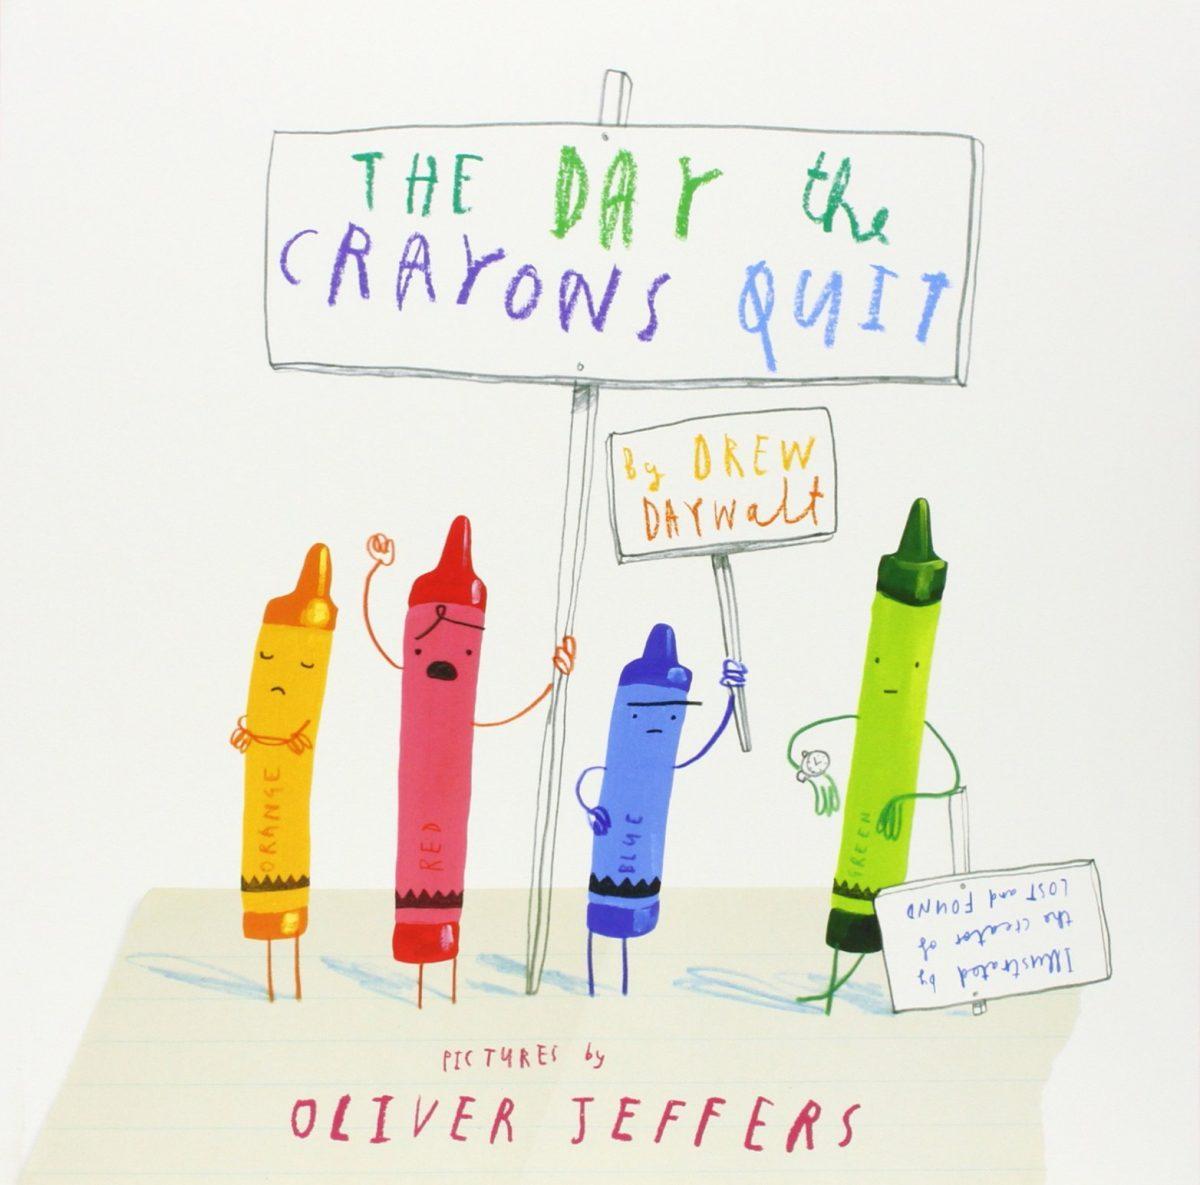 Crayons-Quit-1-1200x1185.jpg